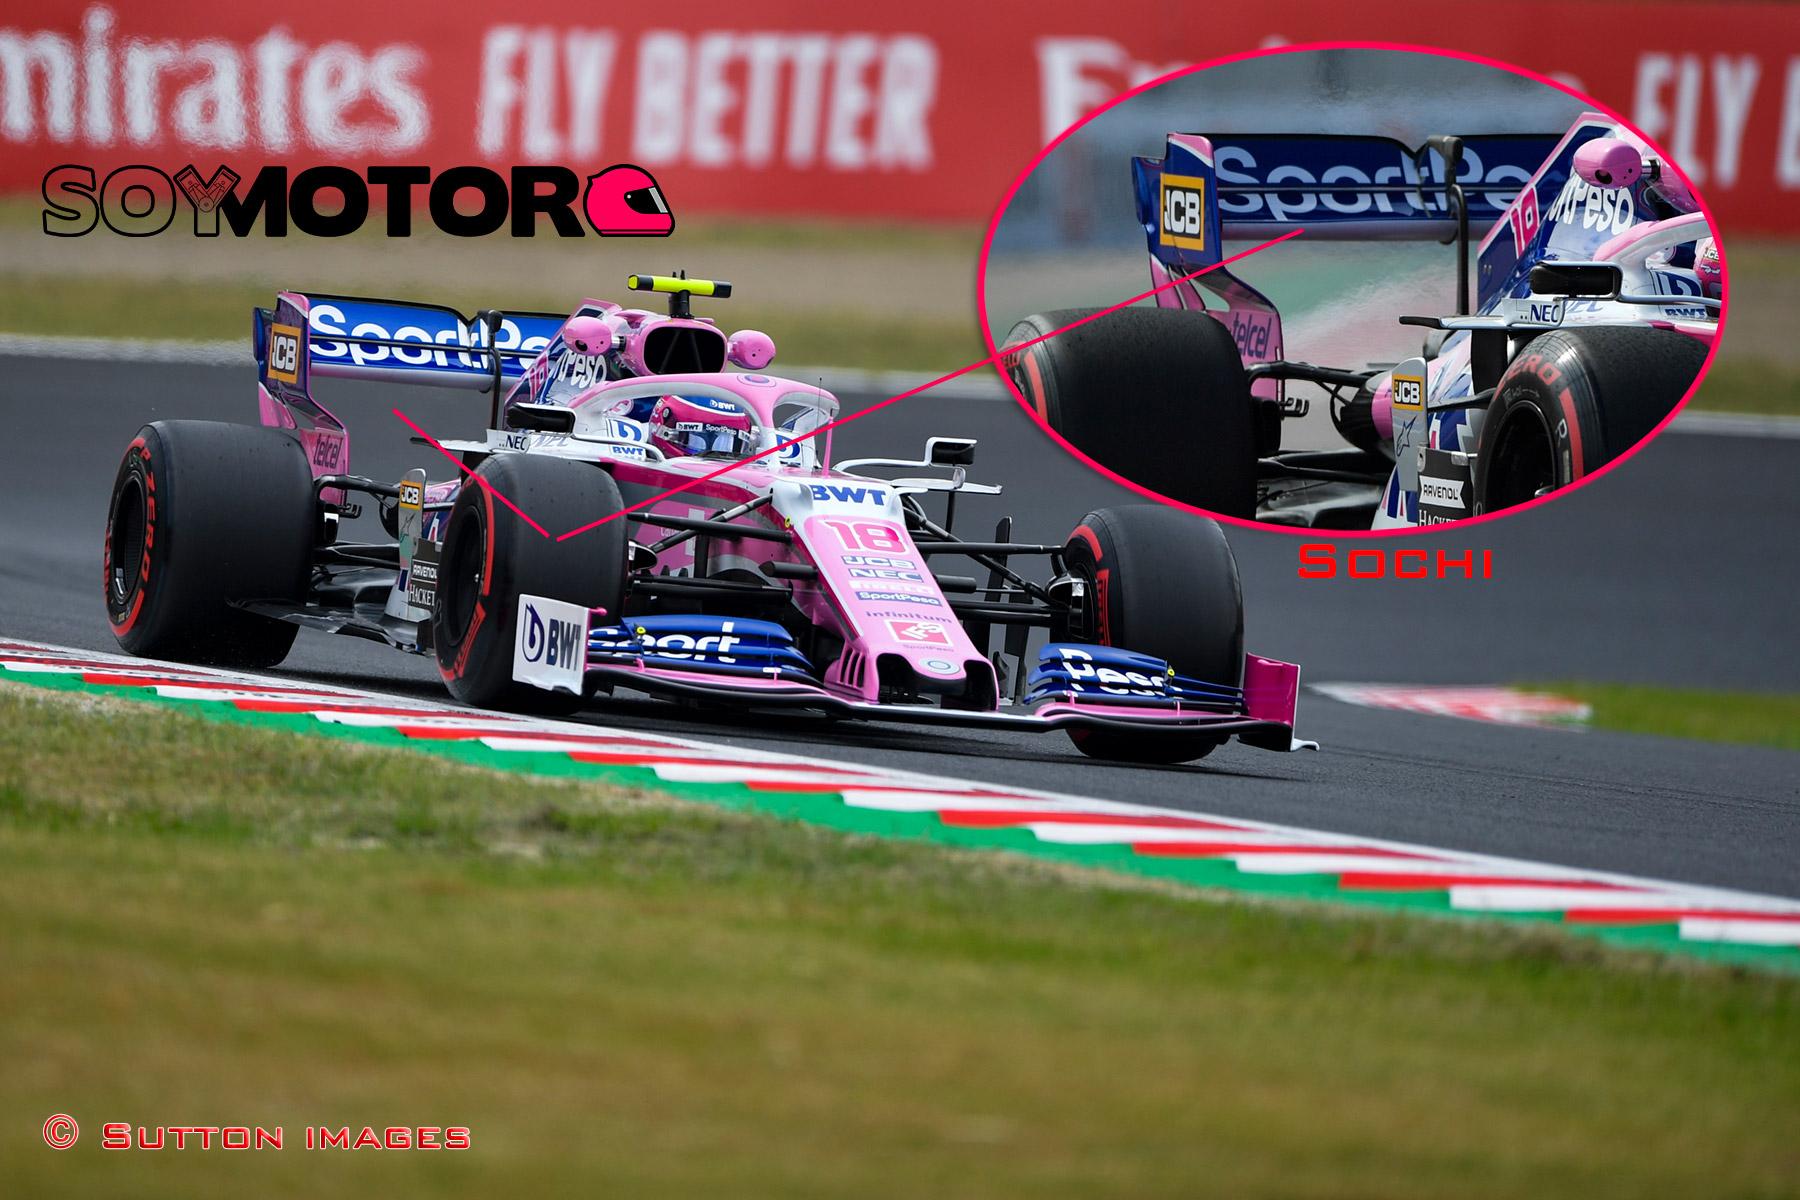 racing-point-ala-trasera-soymotor_1.jpg